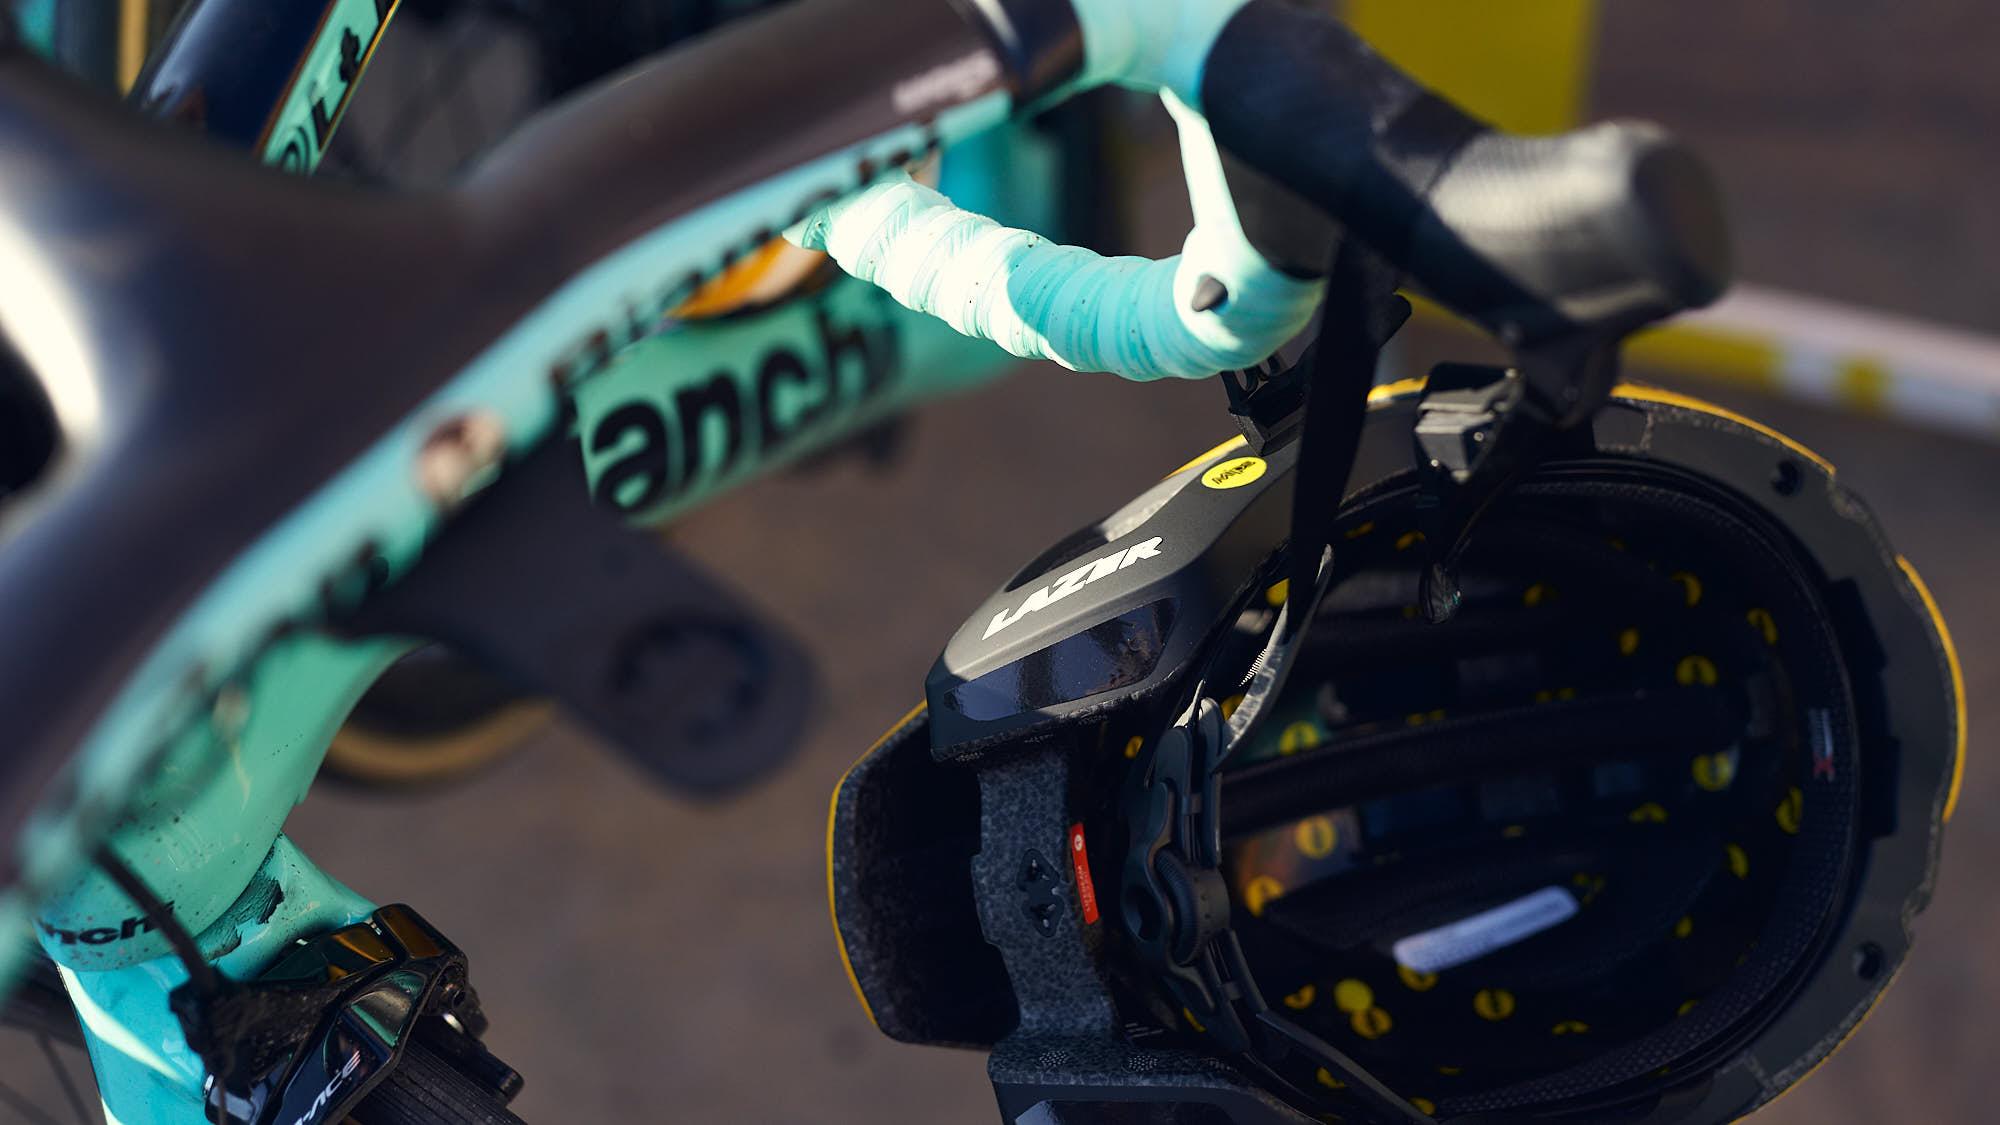 Lazer helmet hanging from a Bianchi bike's handlebars